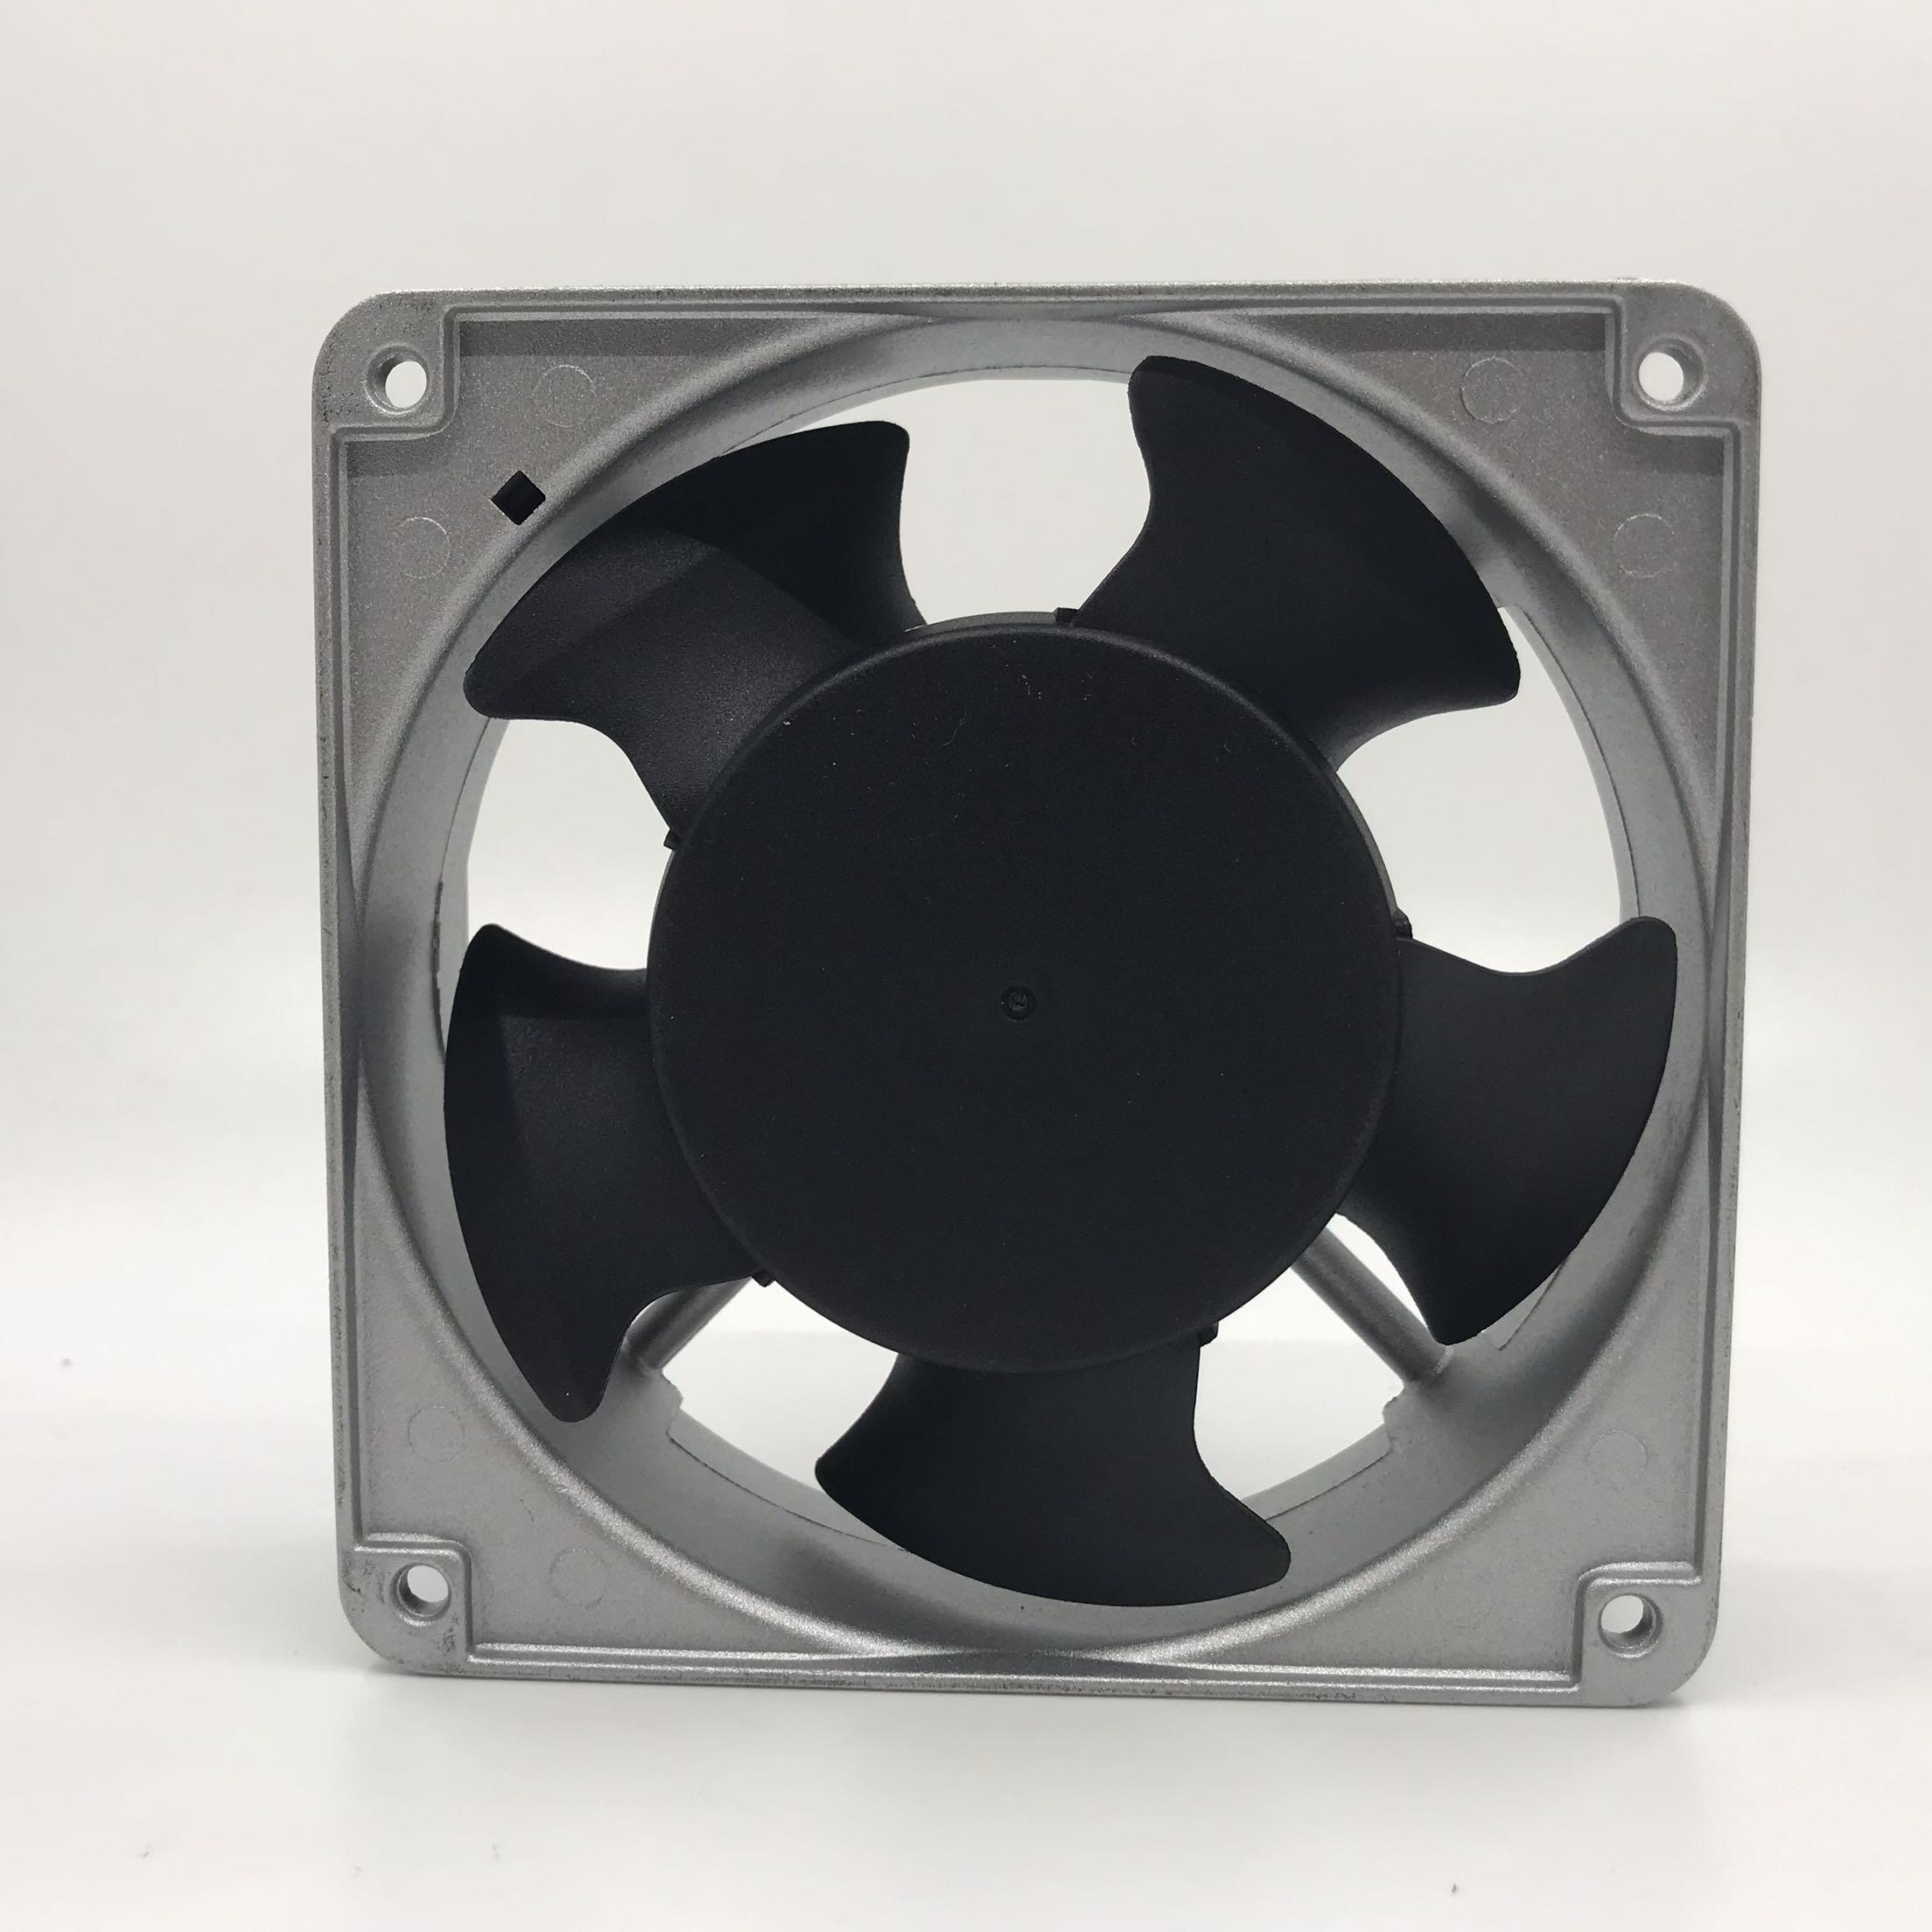 Matsushita ASE104519 AC 100V 15/14W 120x120x38mm Server Cooling Fan